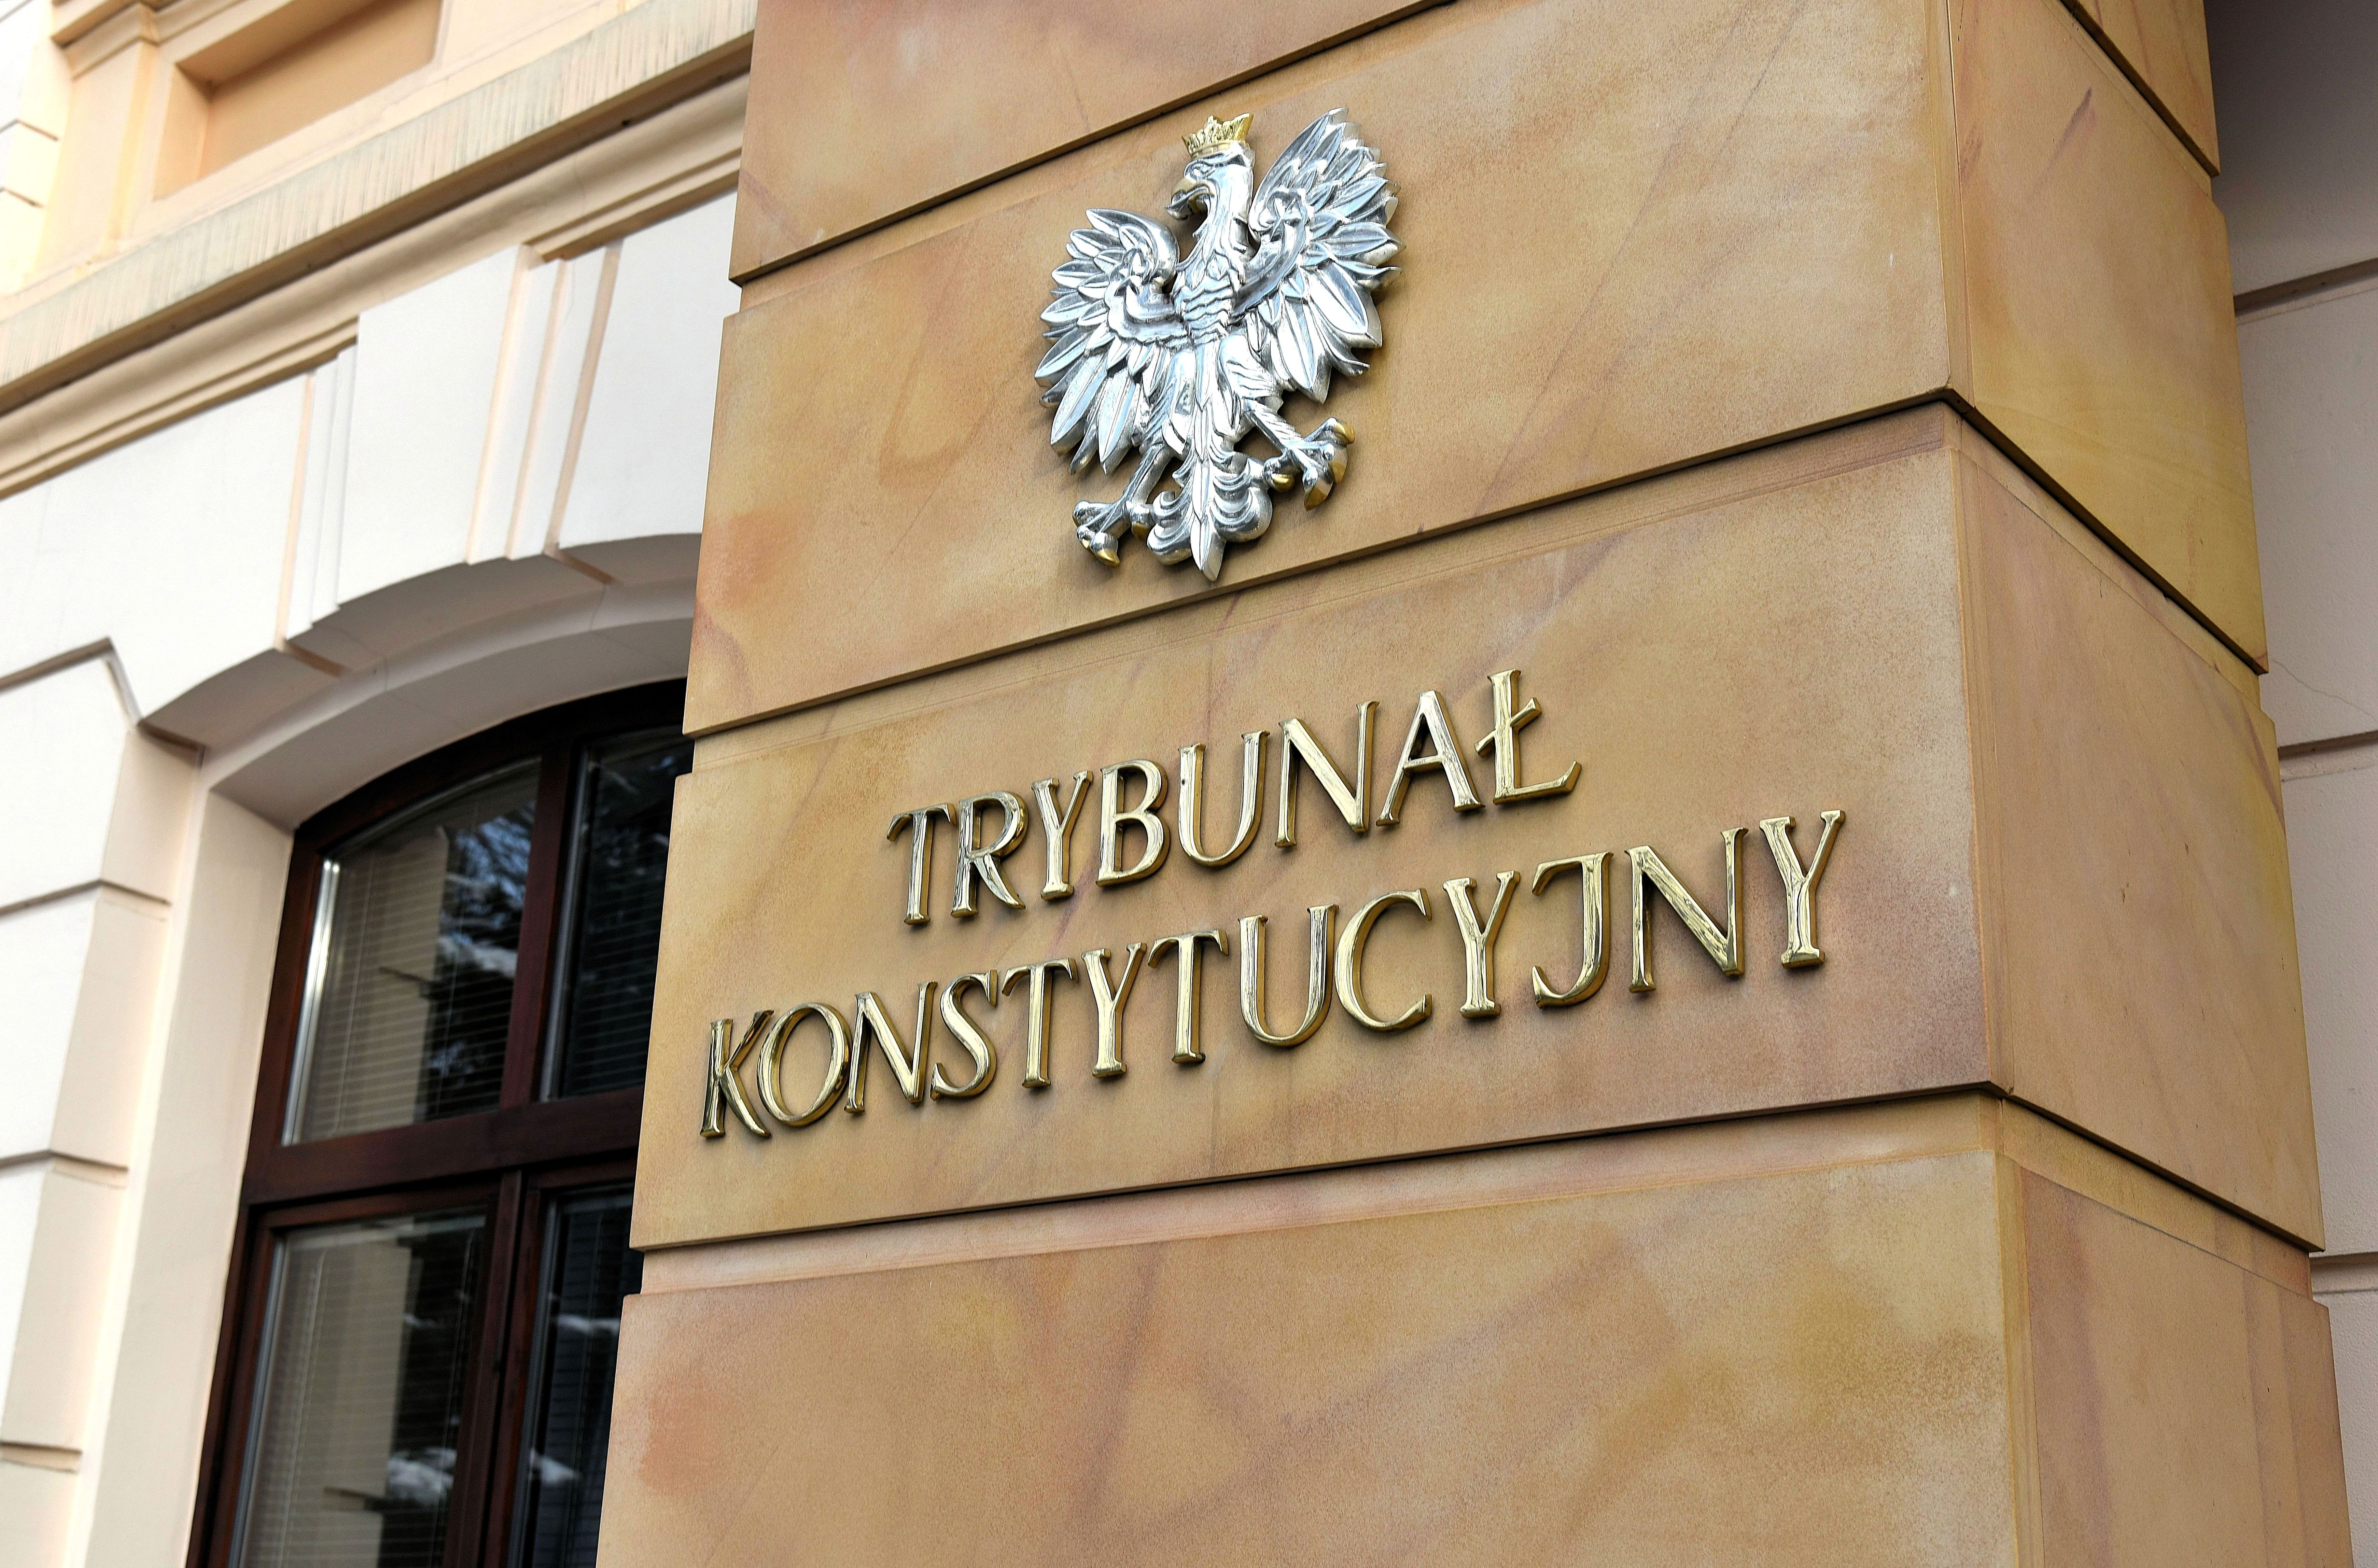 Poland to investigate head of Constitutional Tribunal